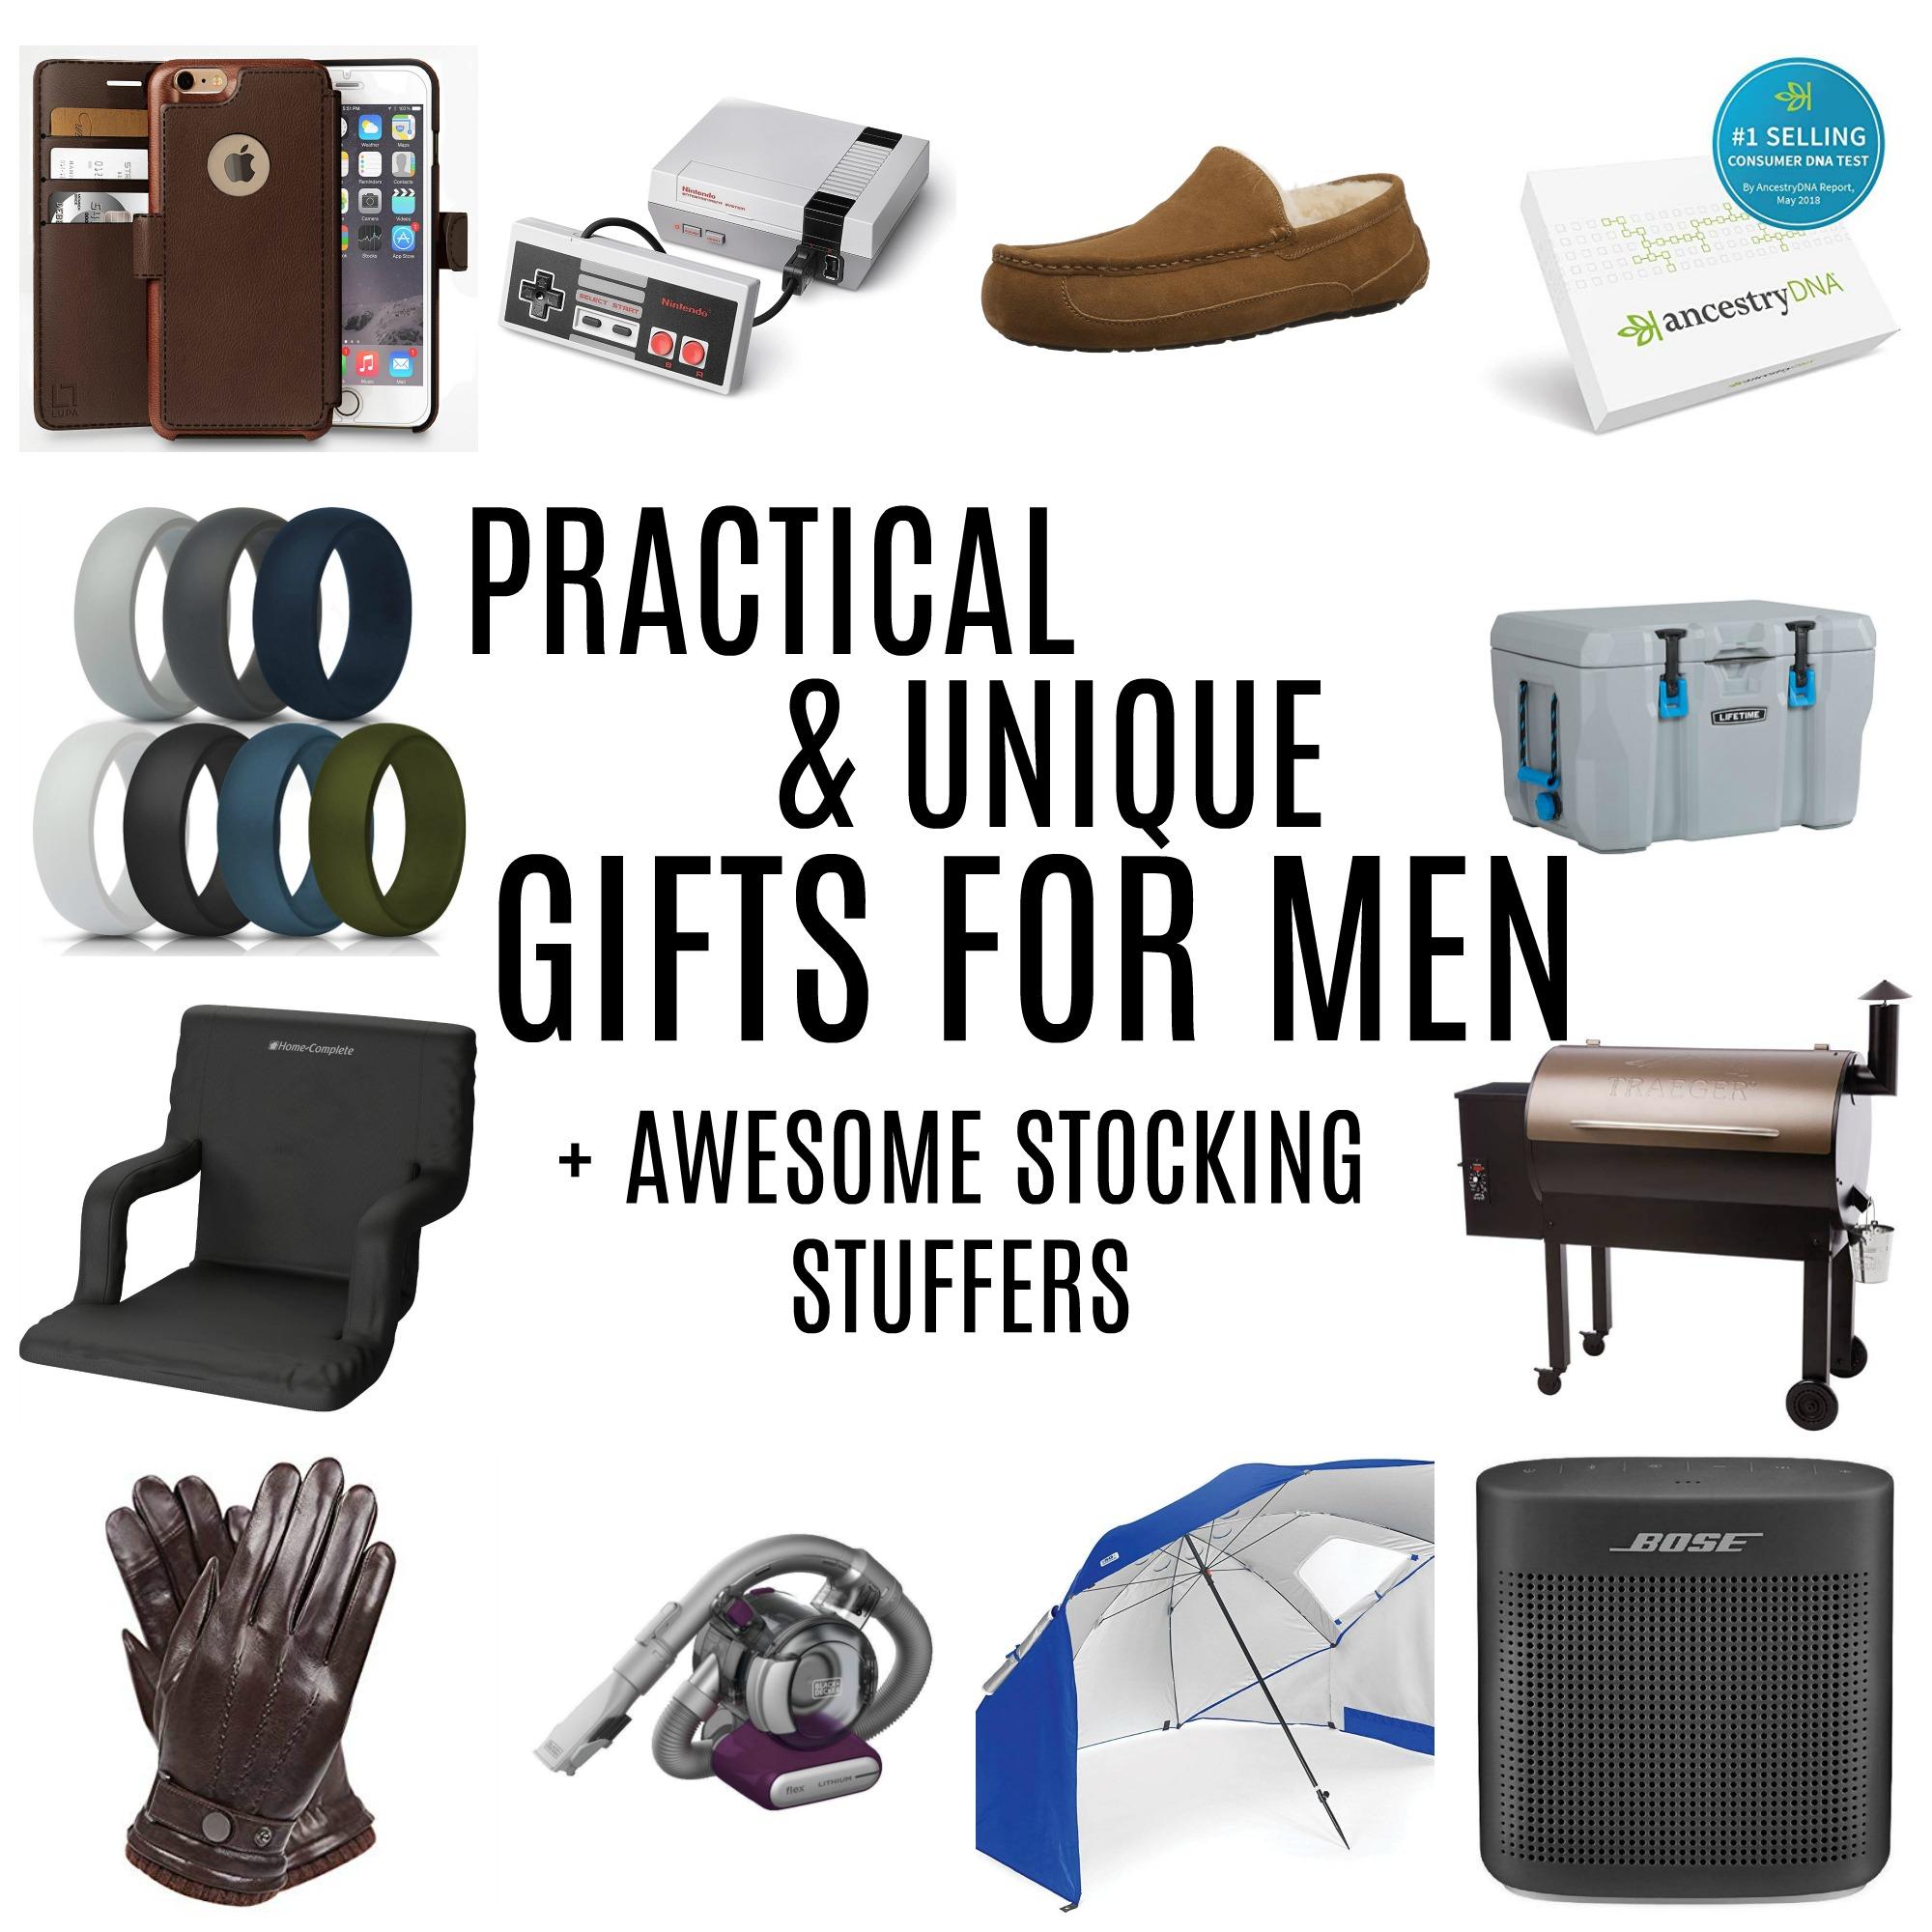 find gifts based on interests